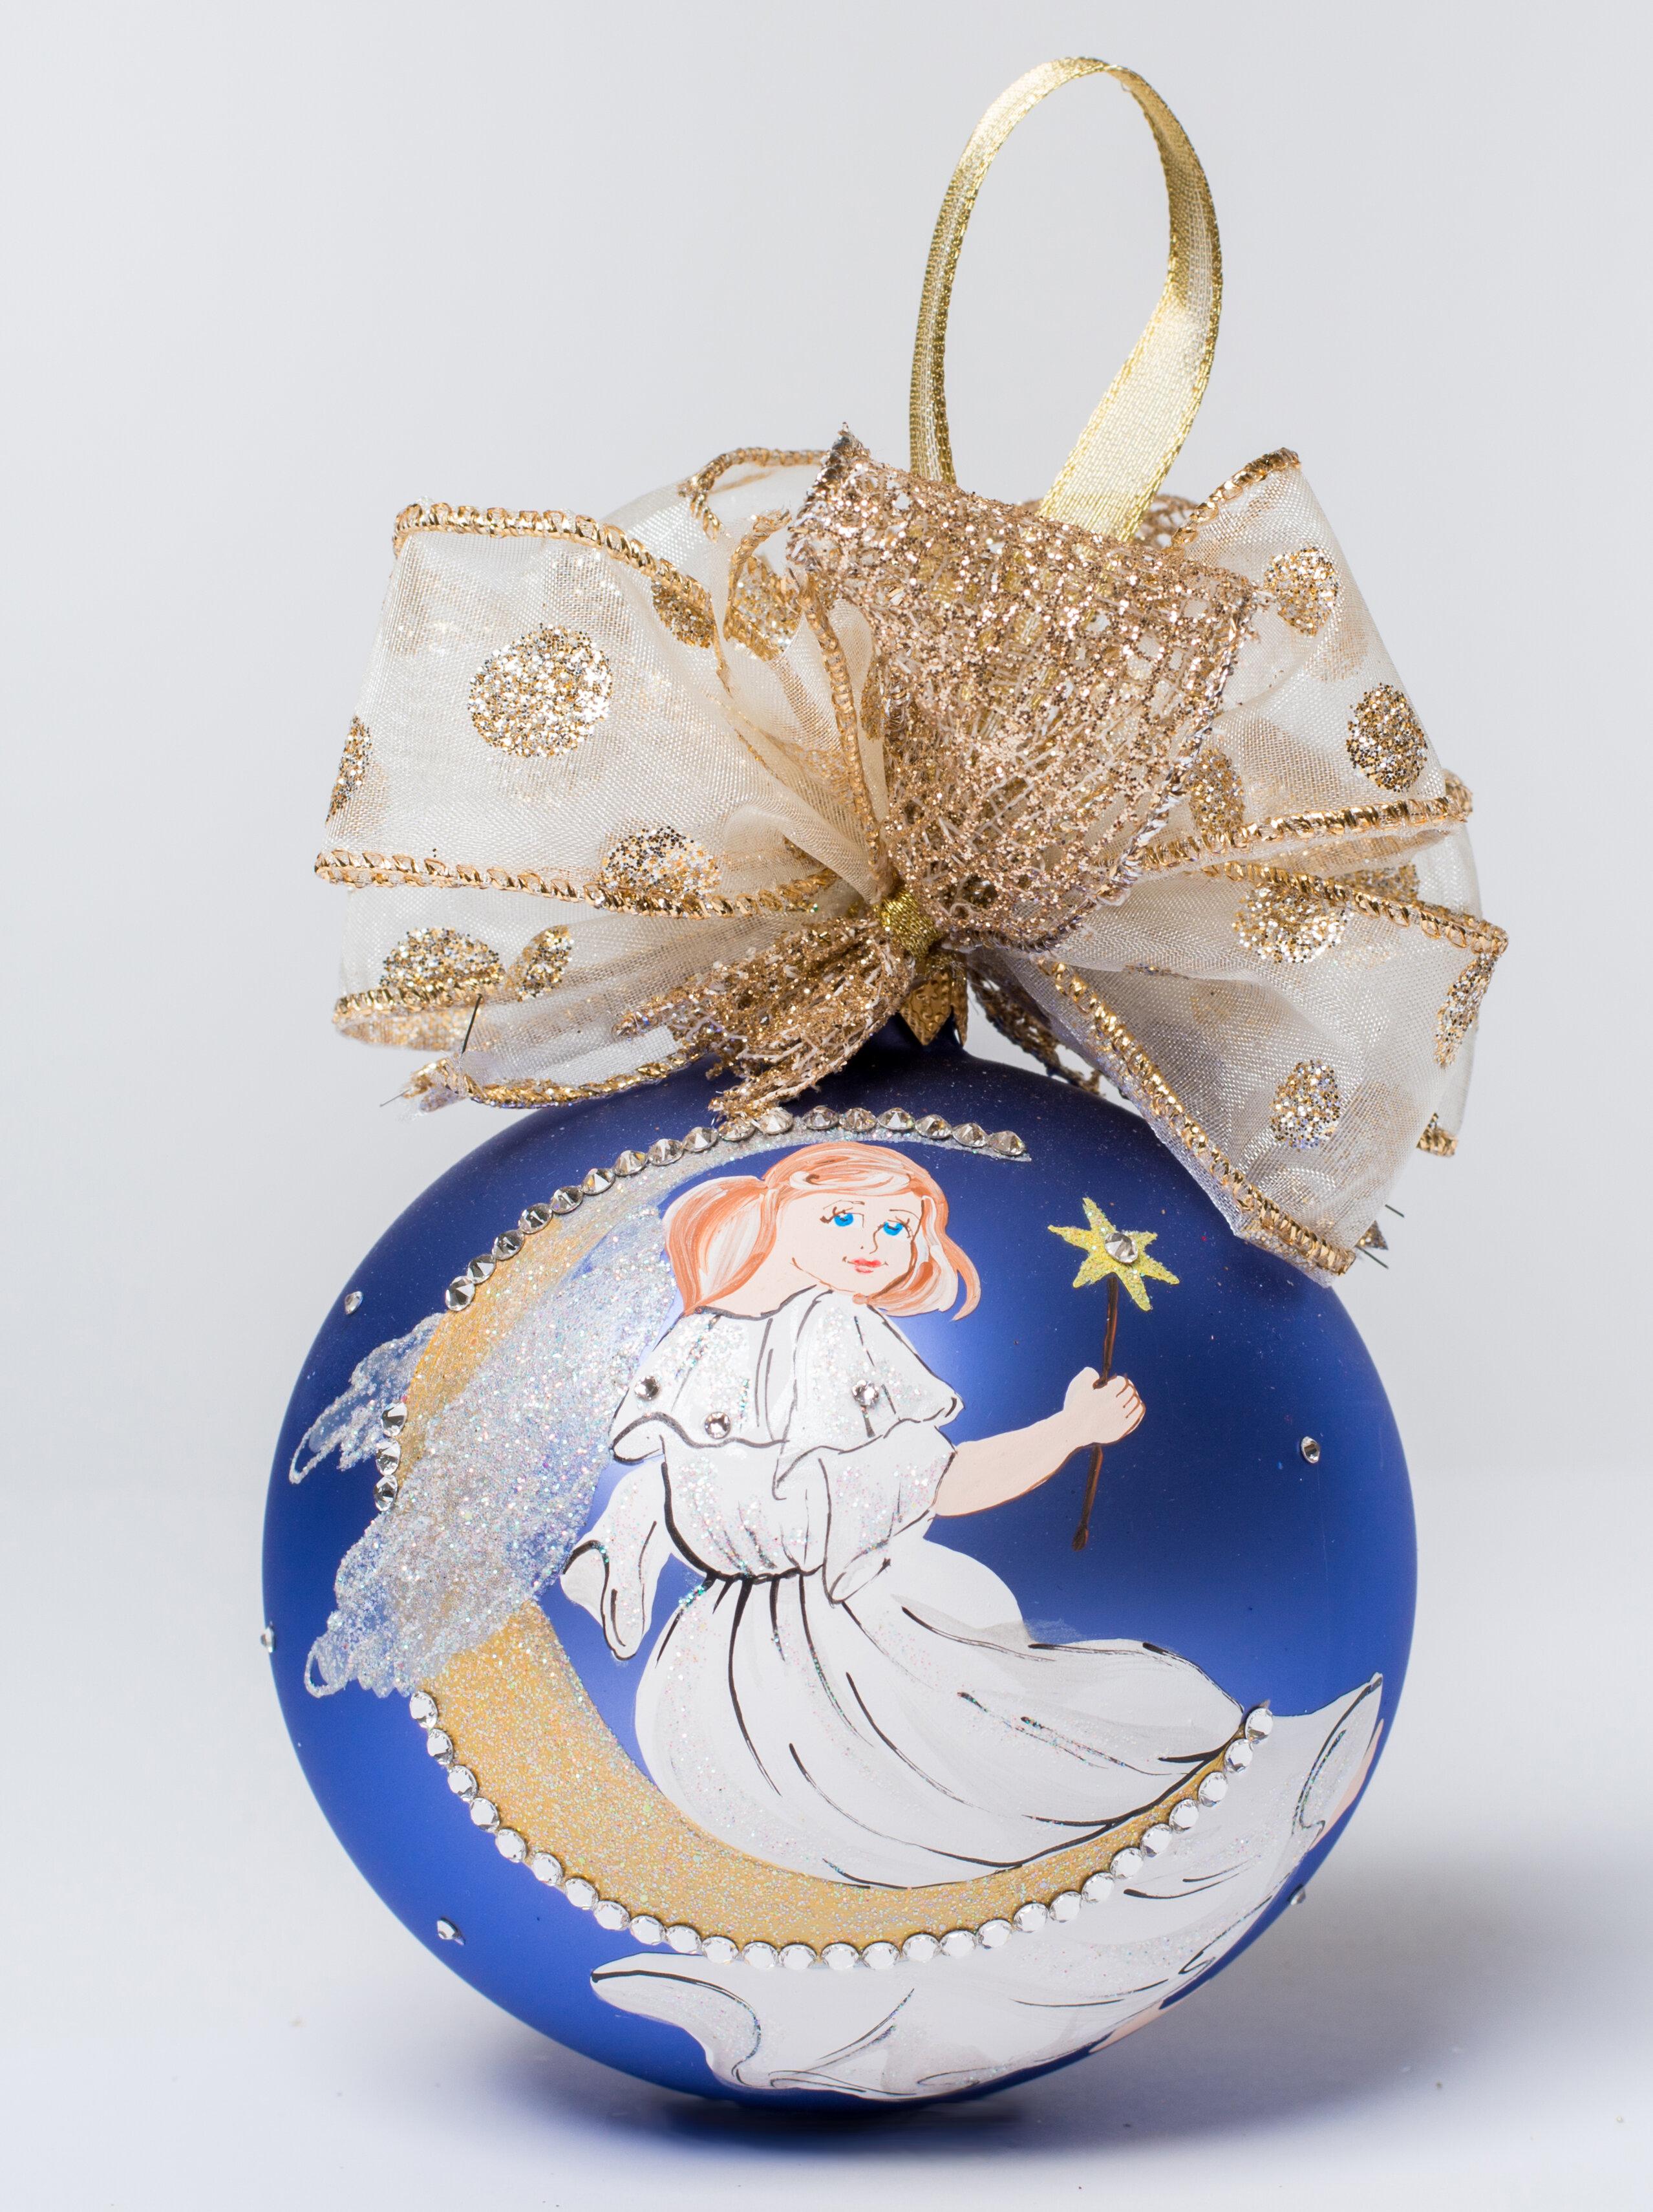 The Holiday Aisle Moonlight Angel Ball Ornament Wayfair